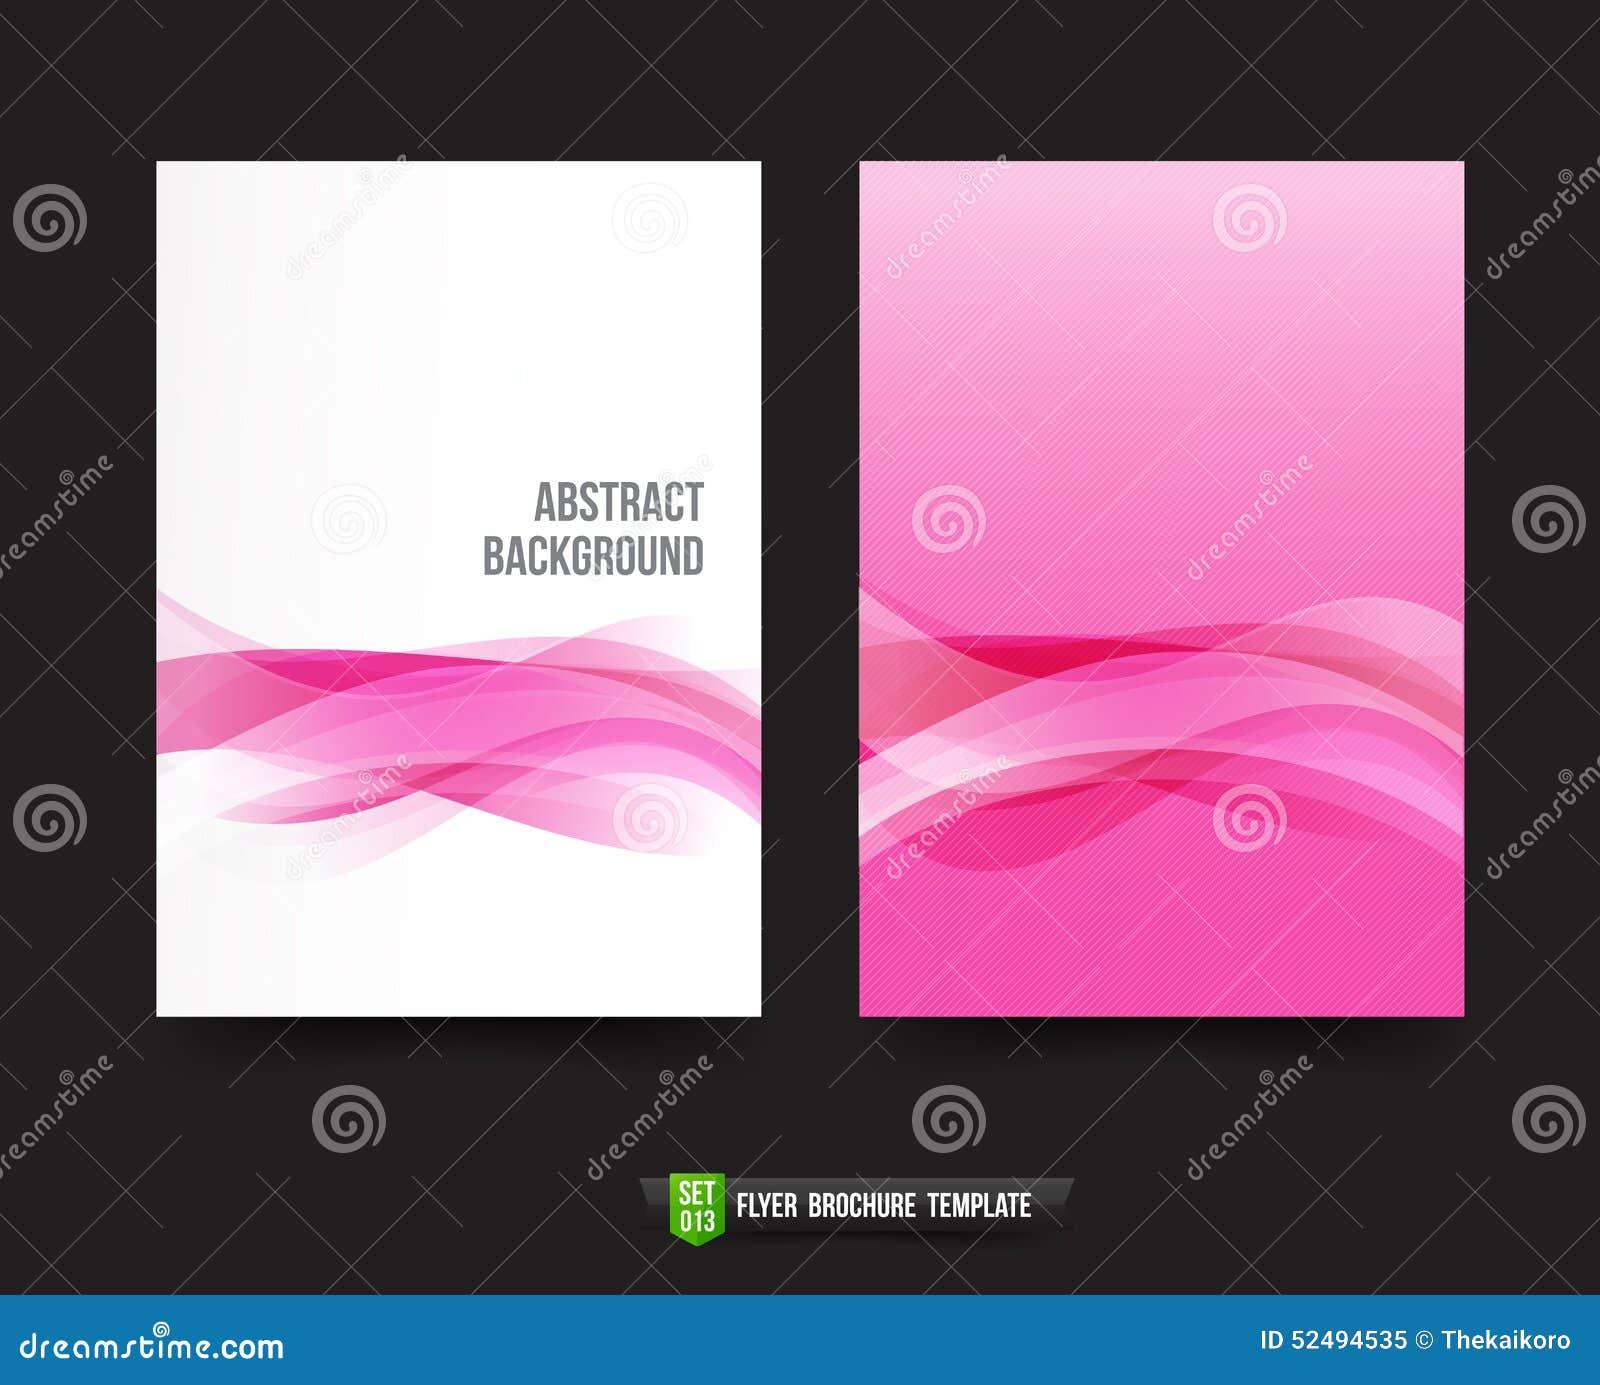 Flyer brochure background template 013 light pink curve for Brochure background templates